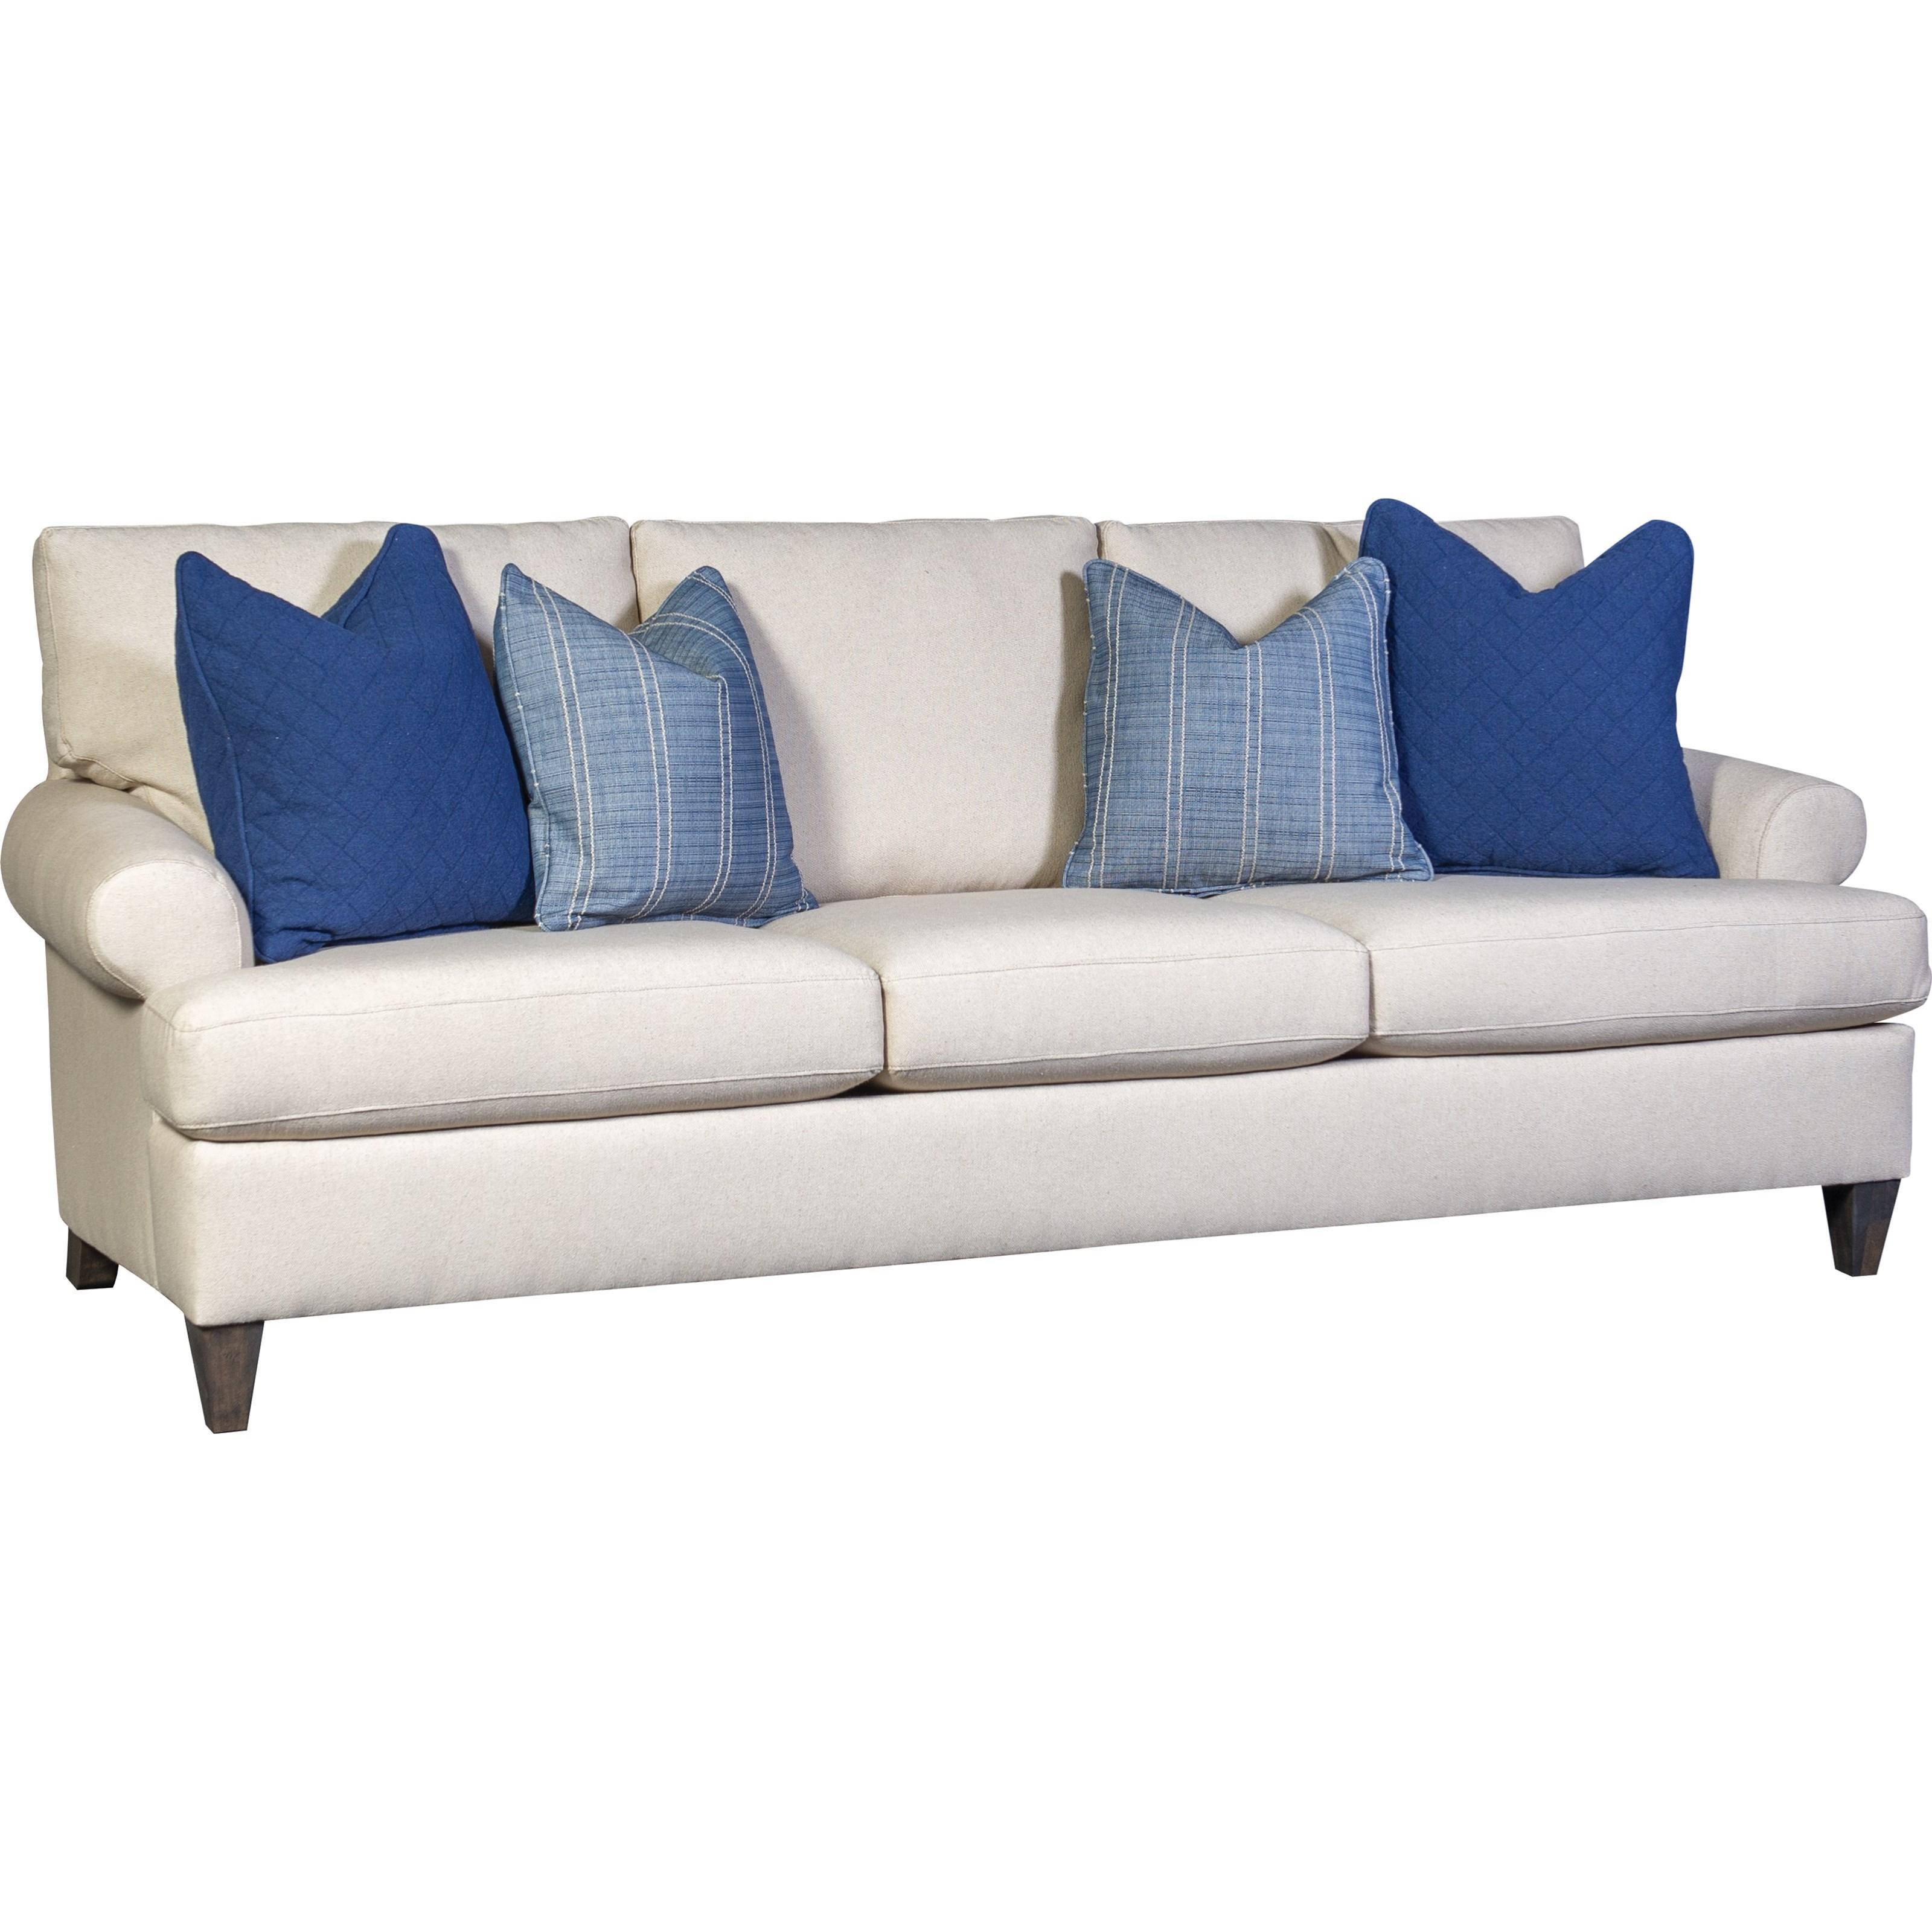 3270 Sofa by Mayo at Wilson's Furniture